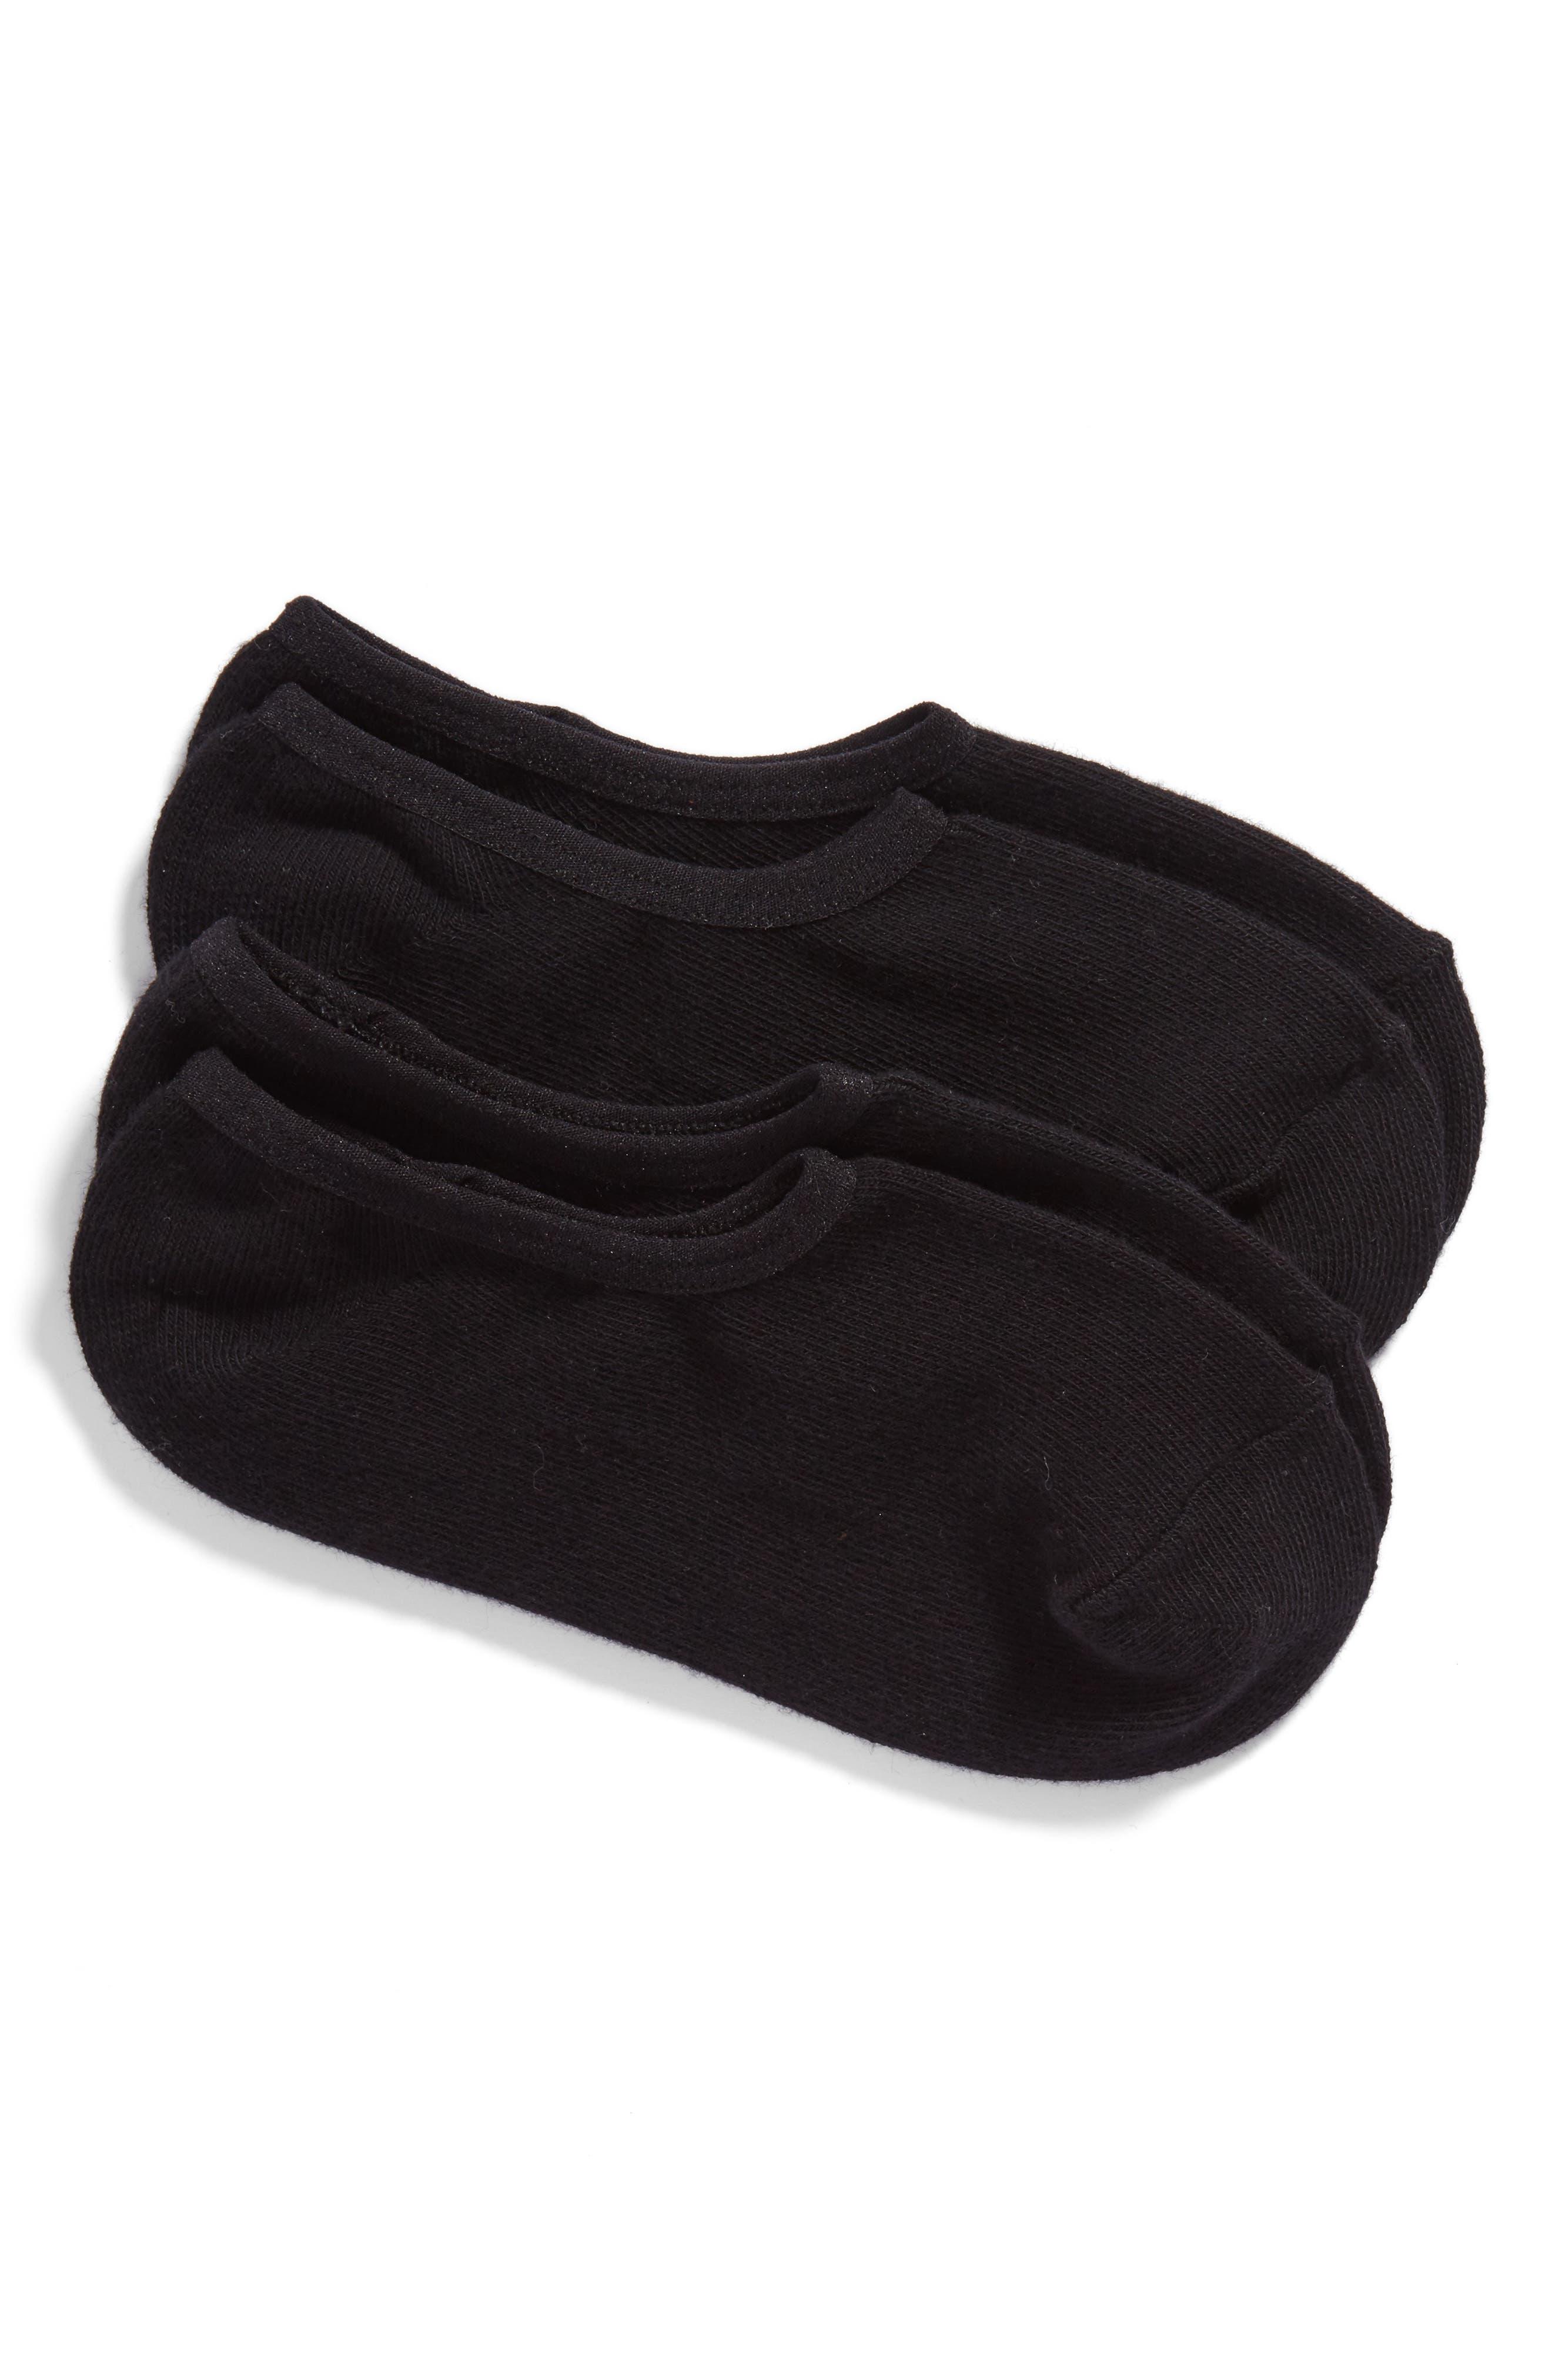 2-Pack Liner Socks,                         Main,                         color,